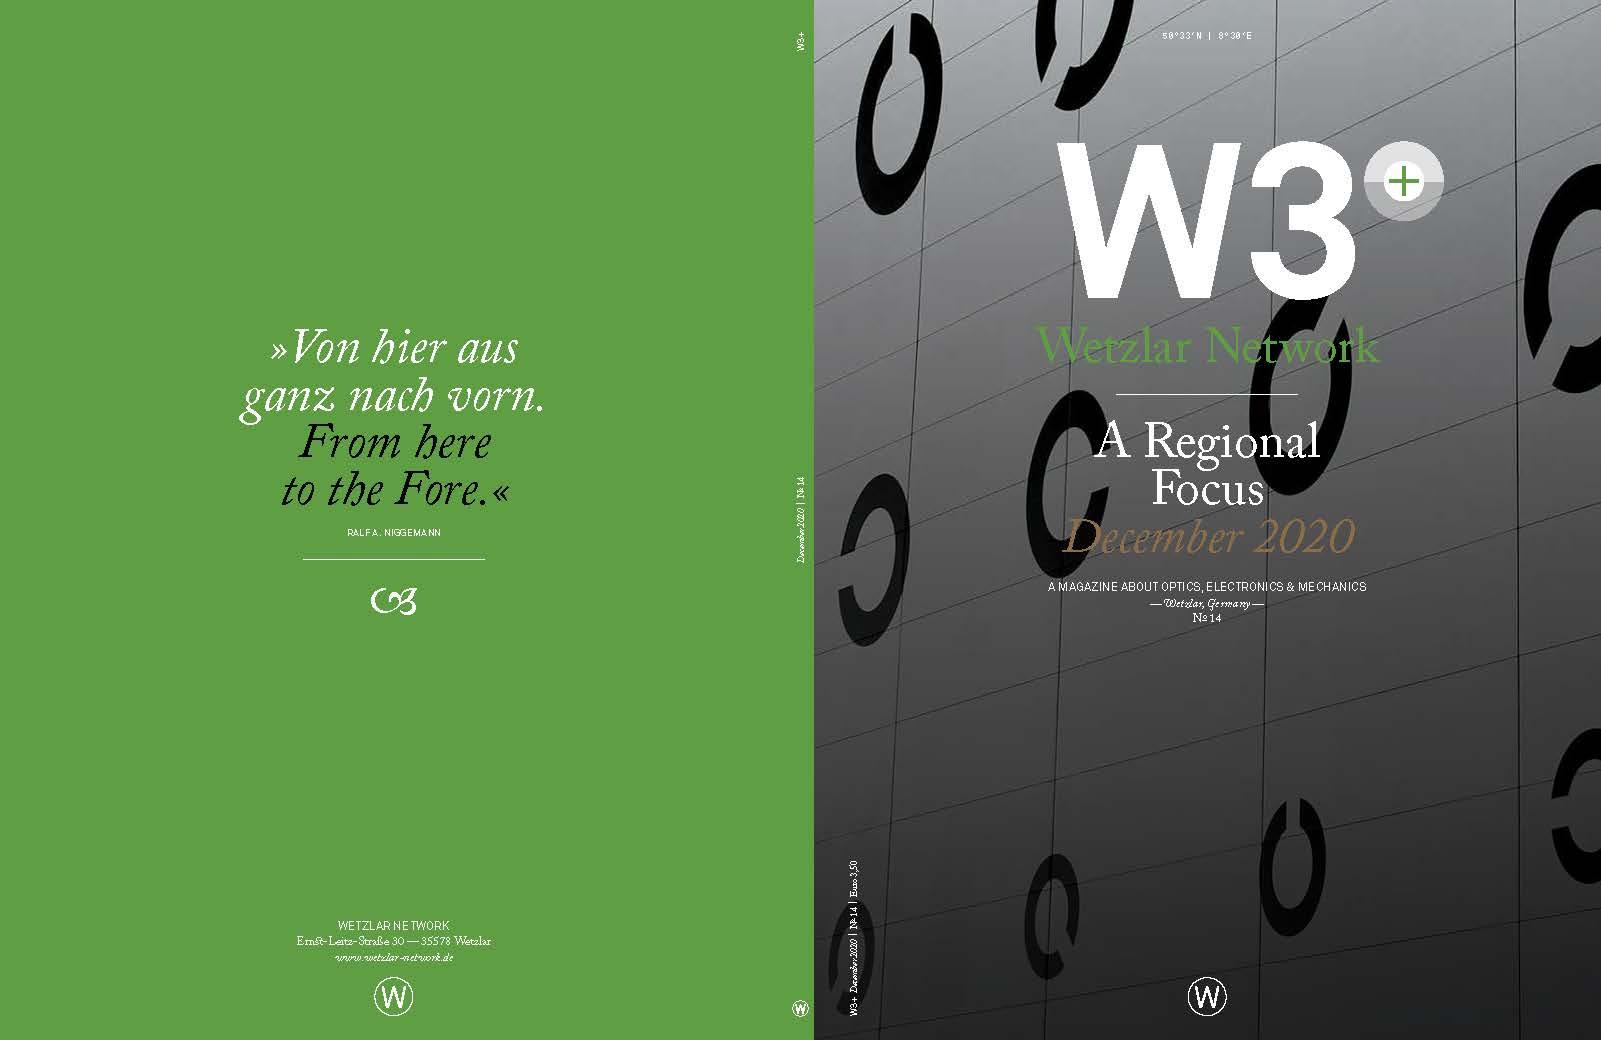 W3+ Wetzlar Network - A Regional Focus